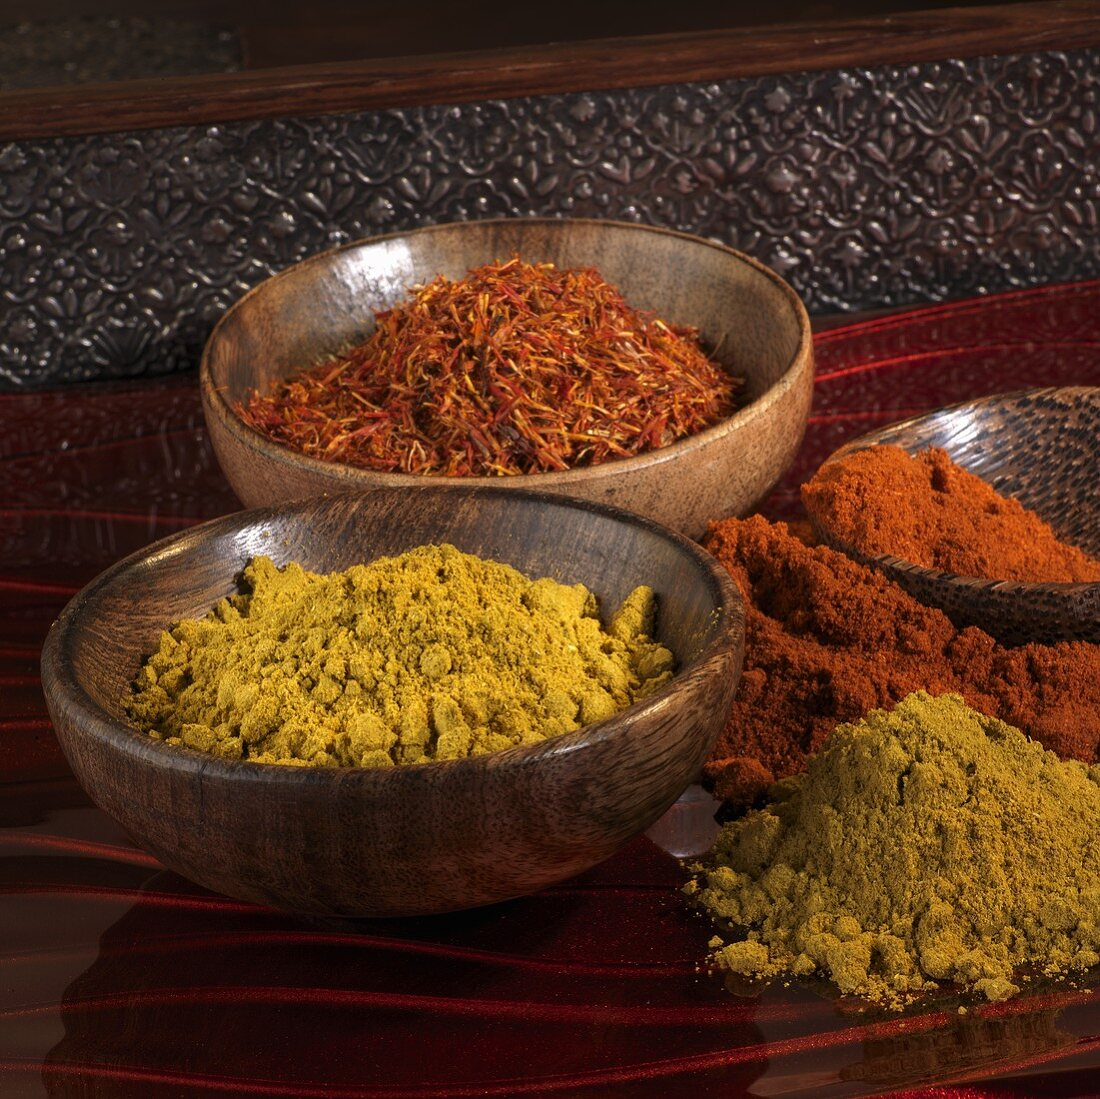 Safflower (saffron substitute), curry powder and paprika